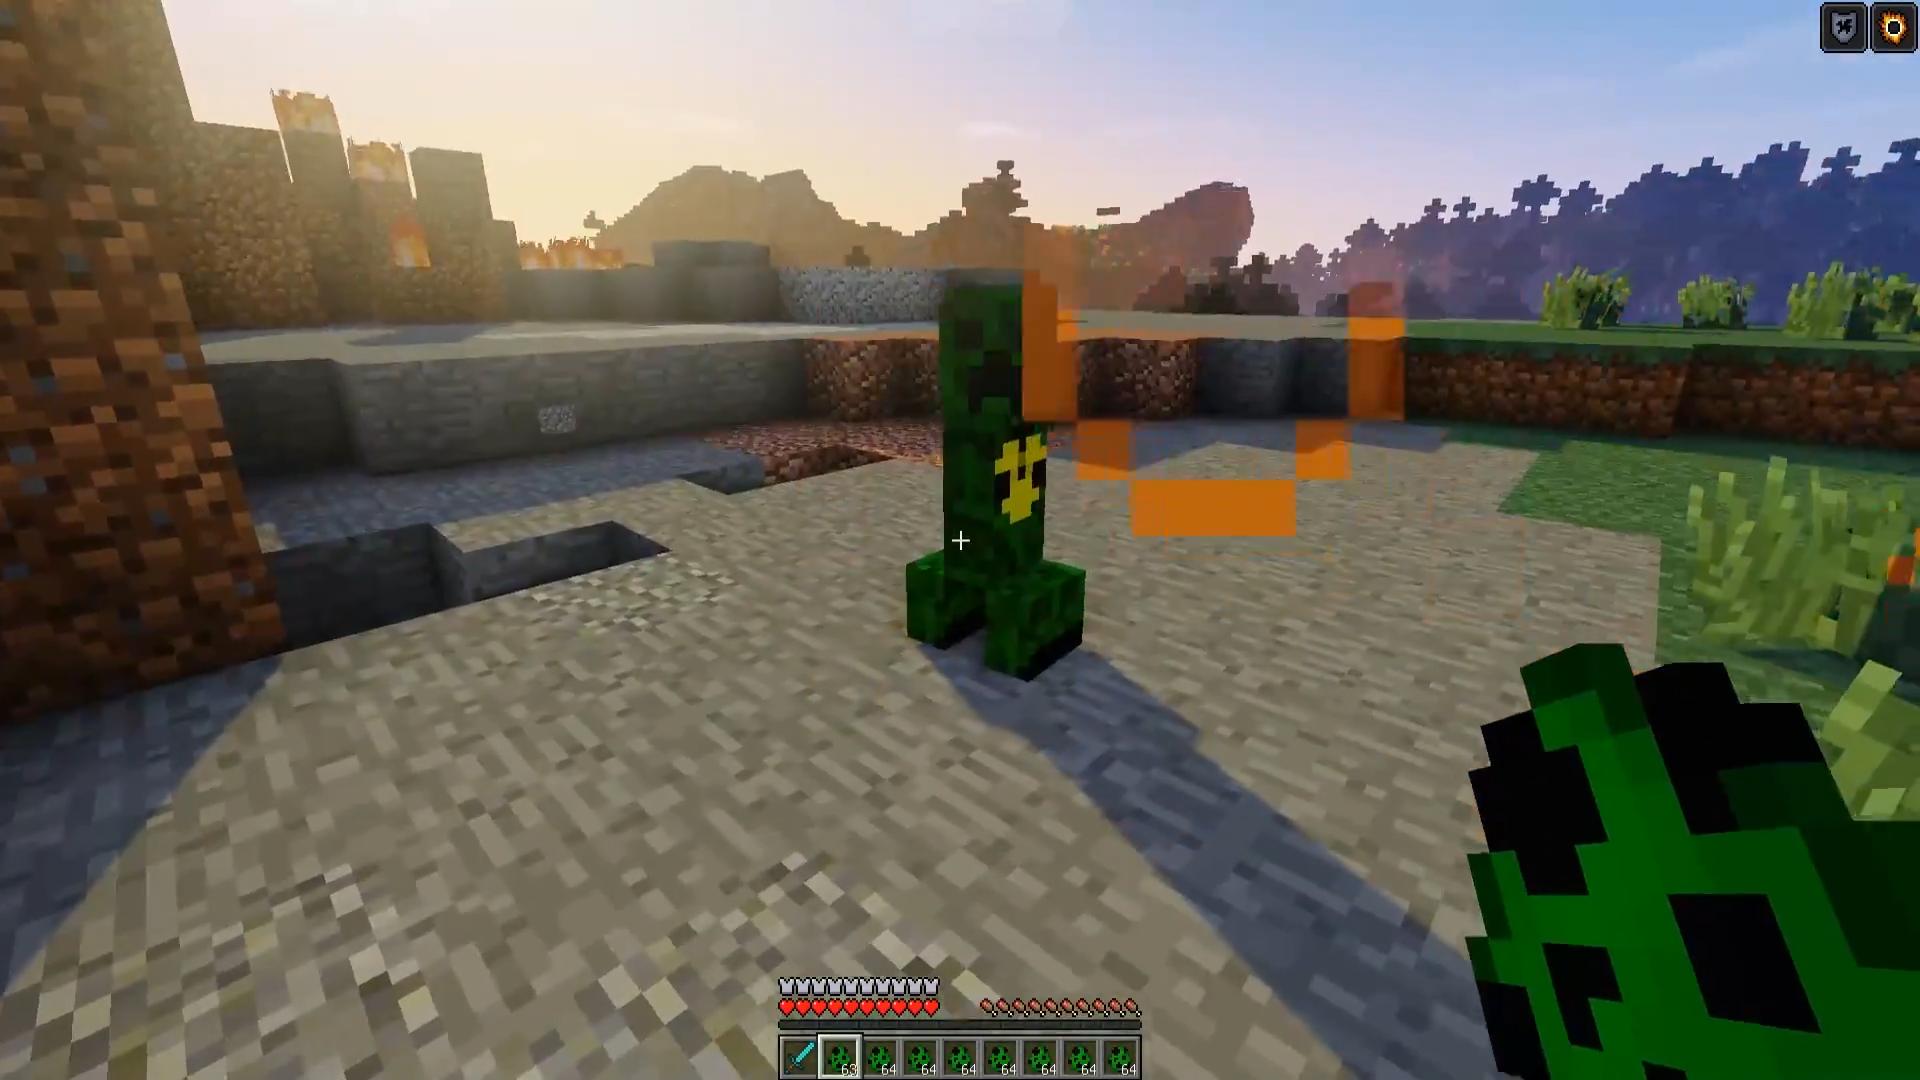 Мод «Elemental Creepers 2» (Новые криперы) - скриншот 6